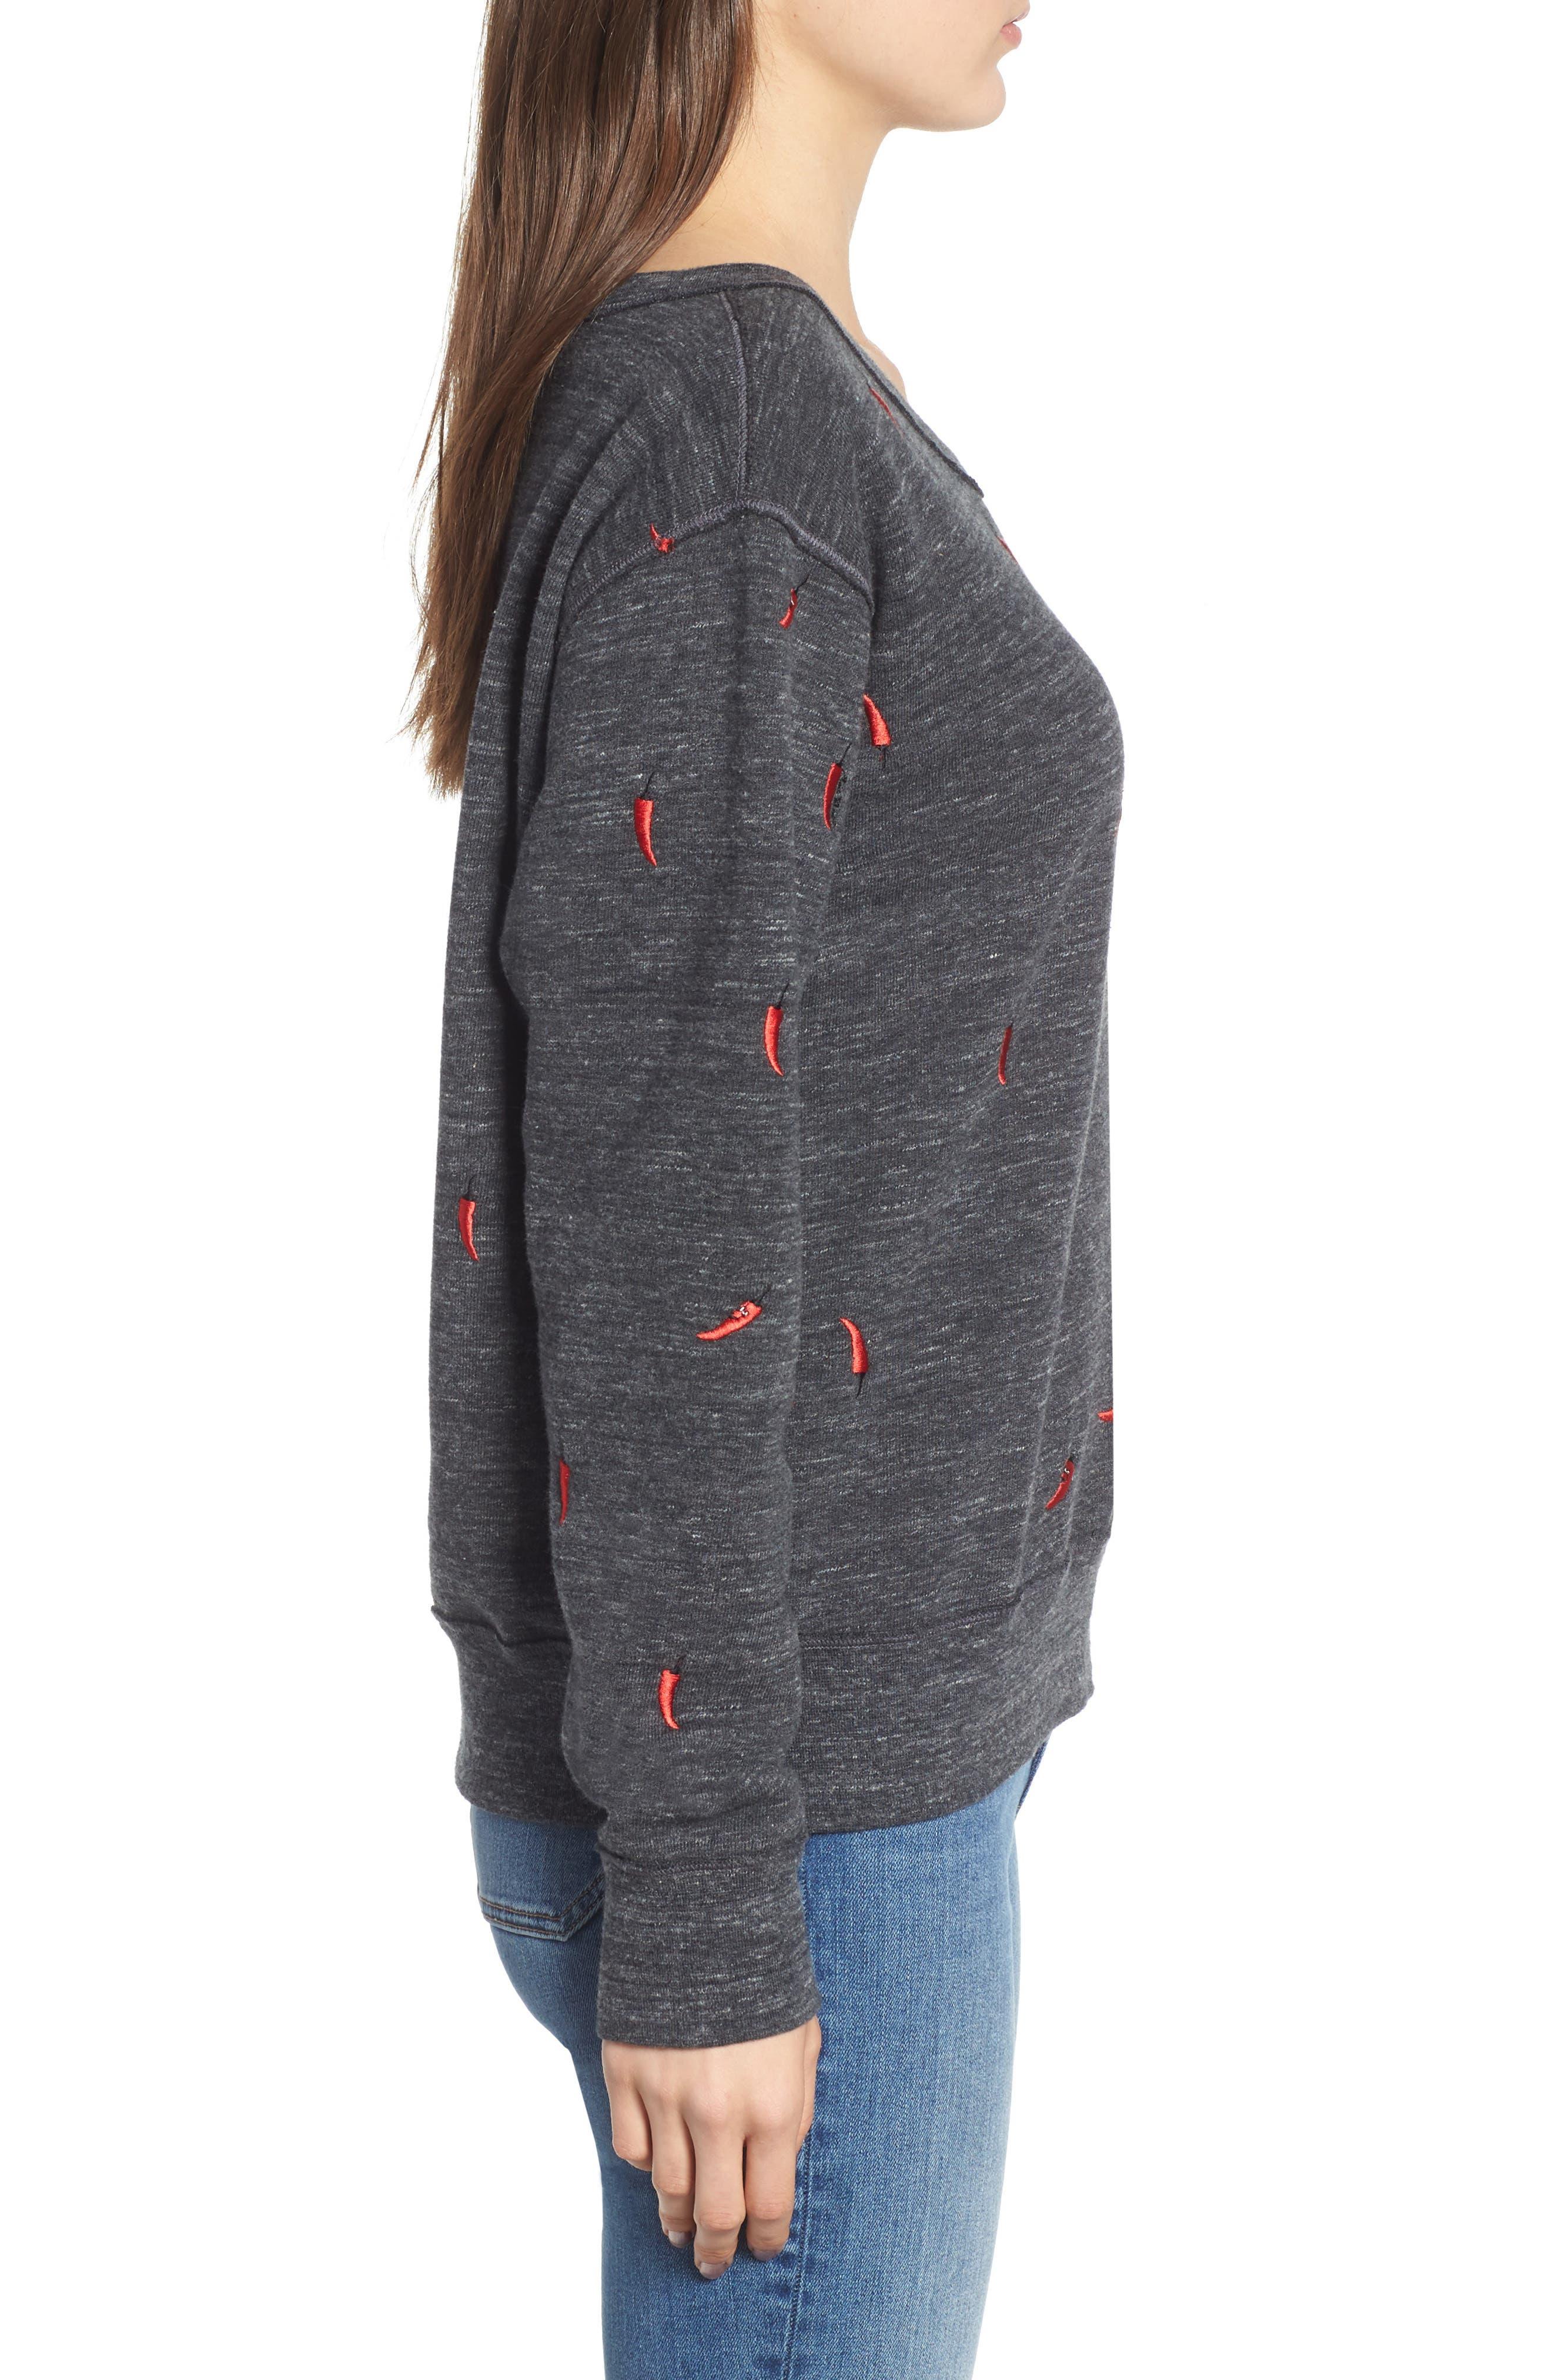 Chili Pepper Crewneck Sweatshirt,                             Alternate thumbnail 3, color,                             021